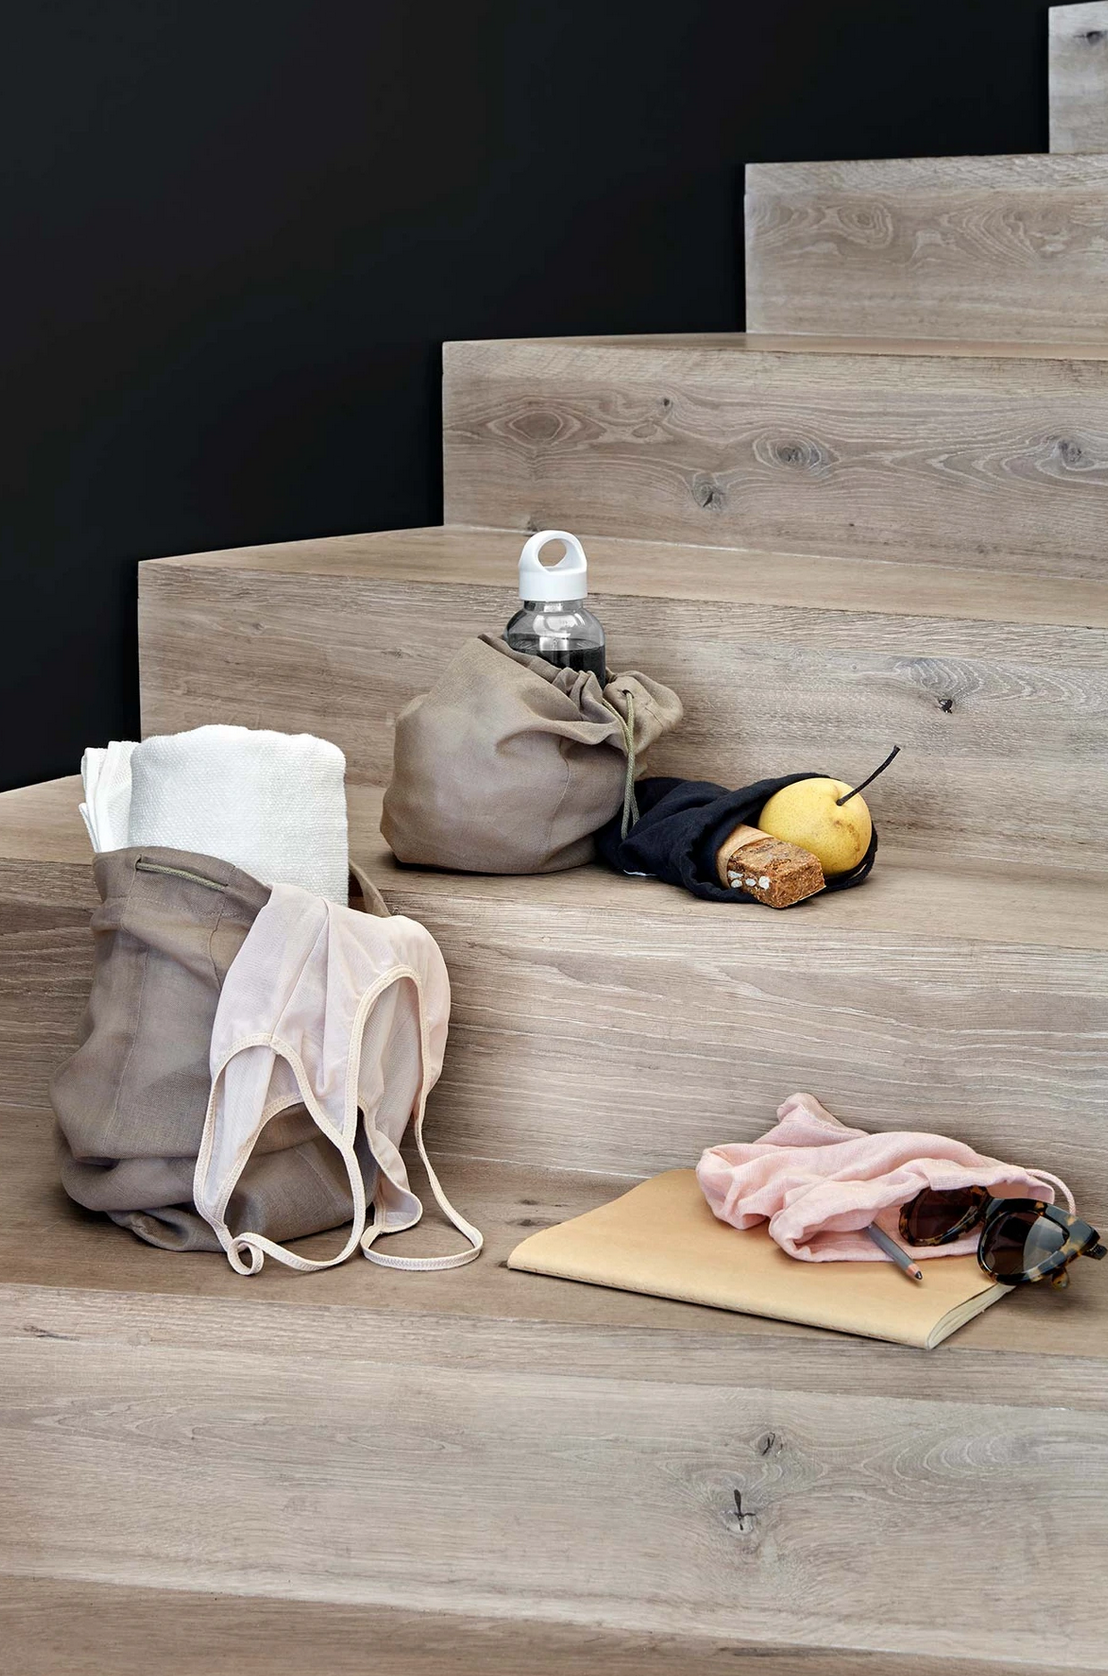 Set Multifunctionele Tassen - Clay - The Organic Company-4